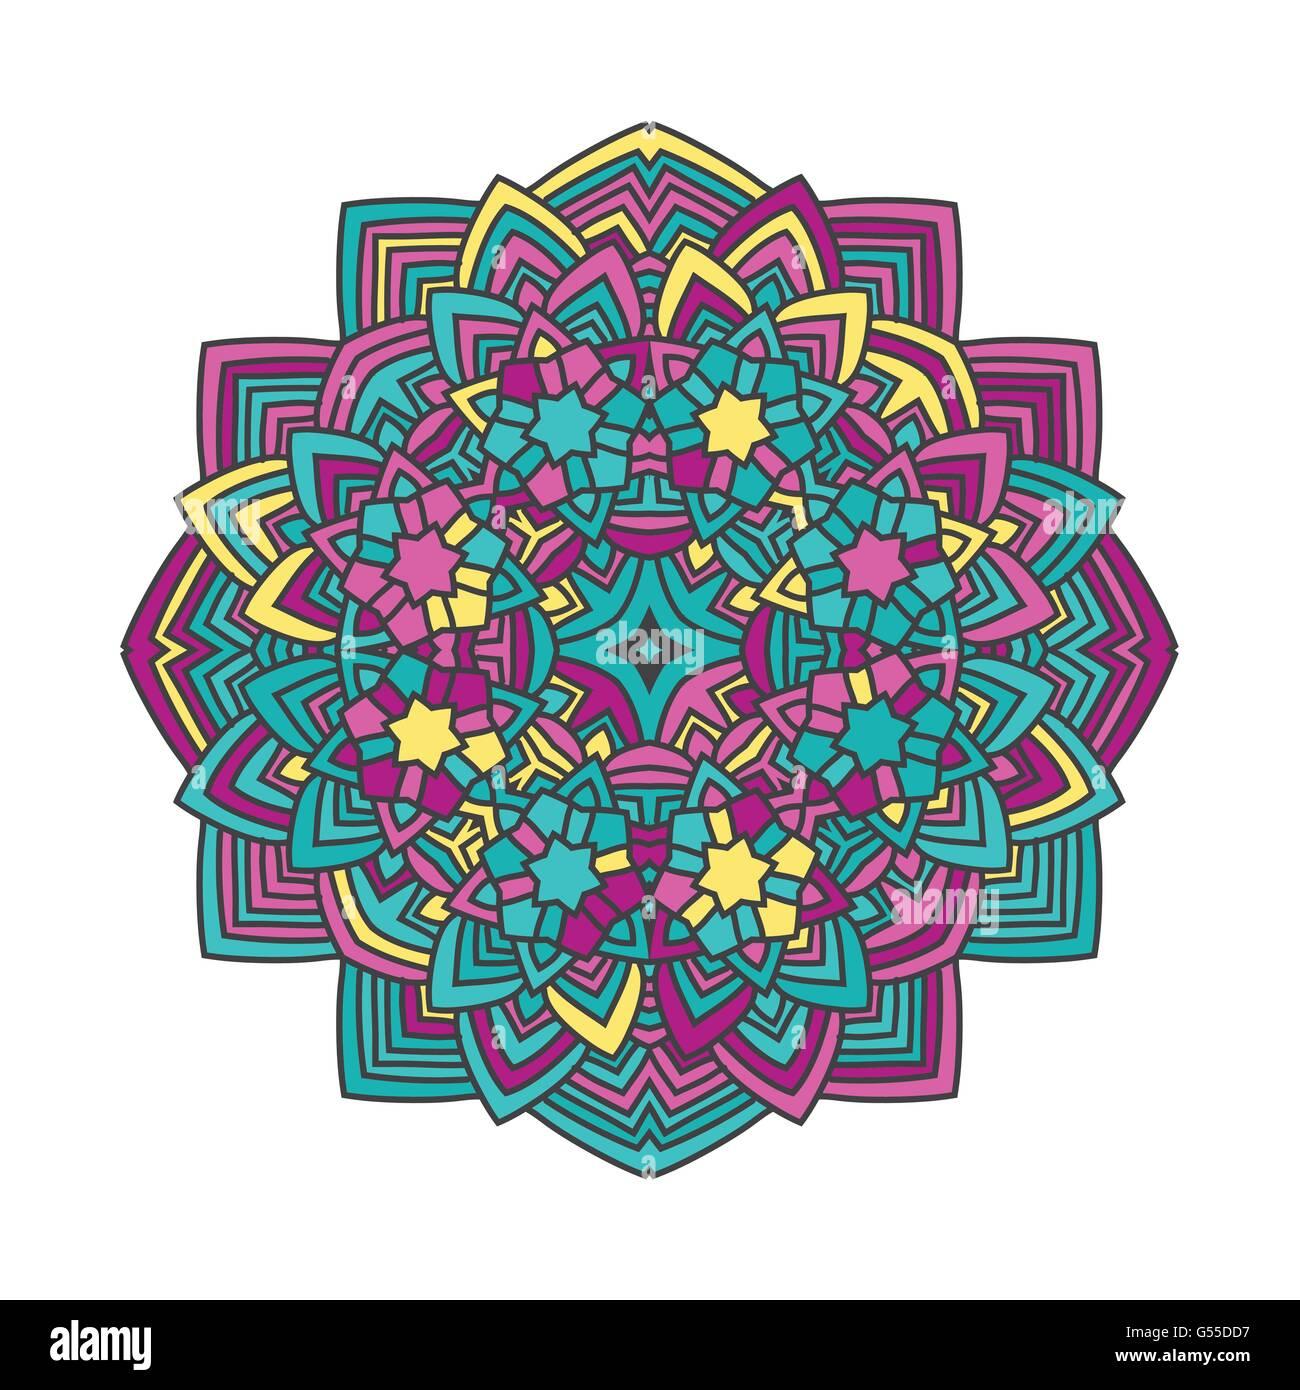 Abstract Color Flower Mandala Vector Illustration